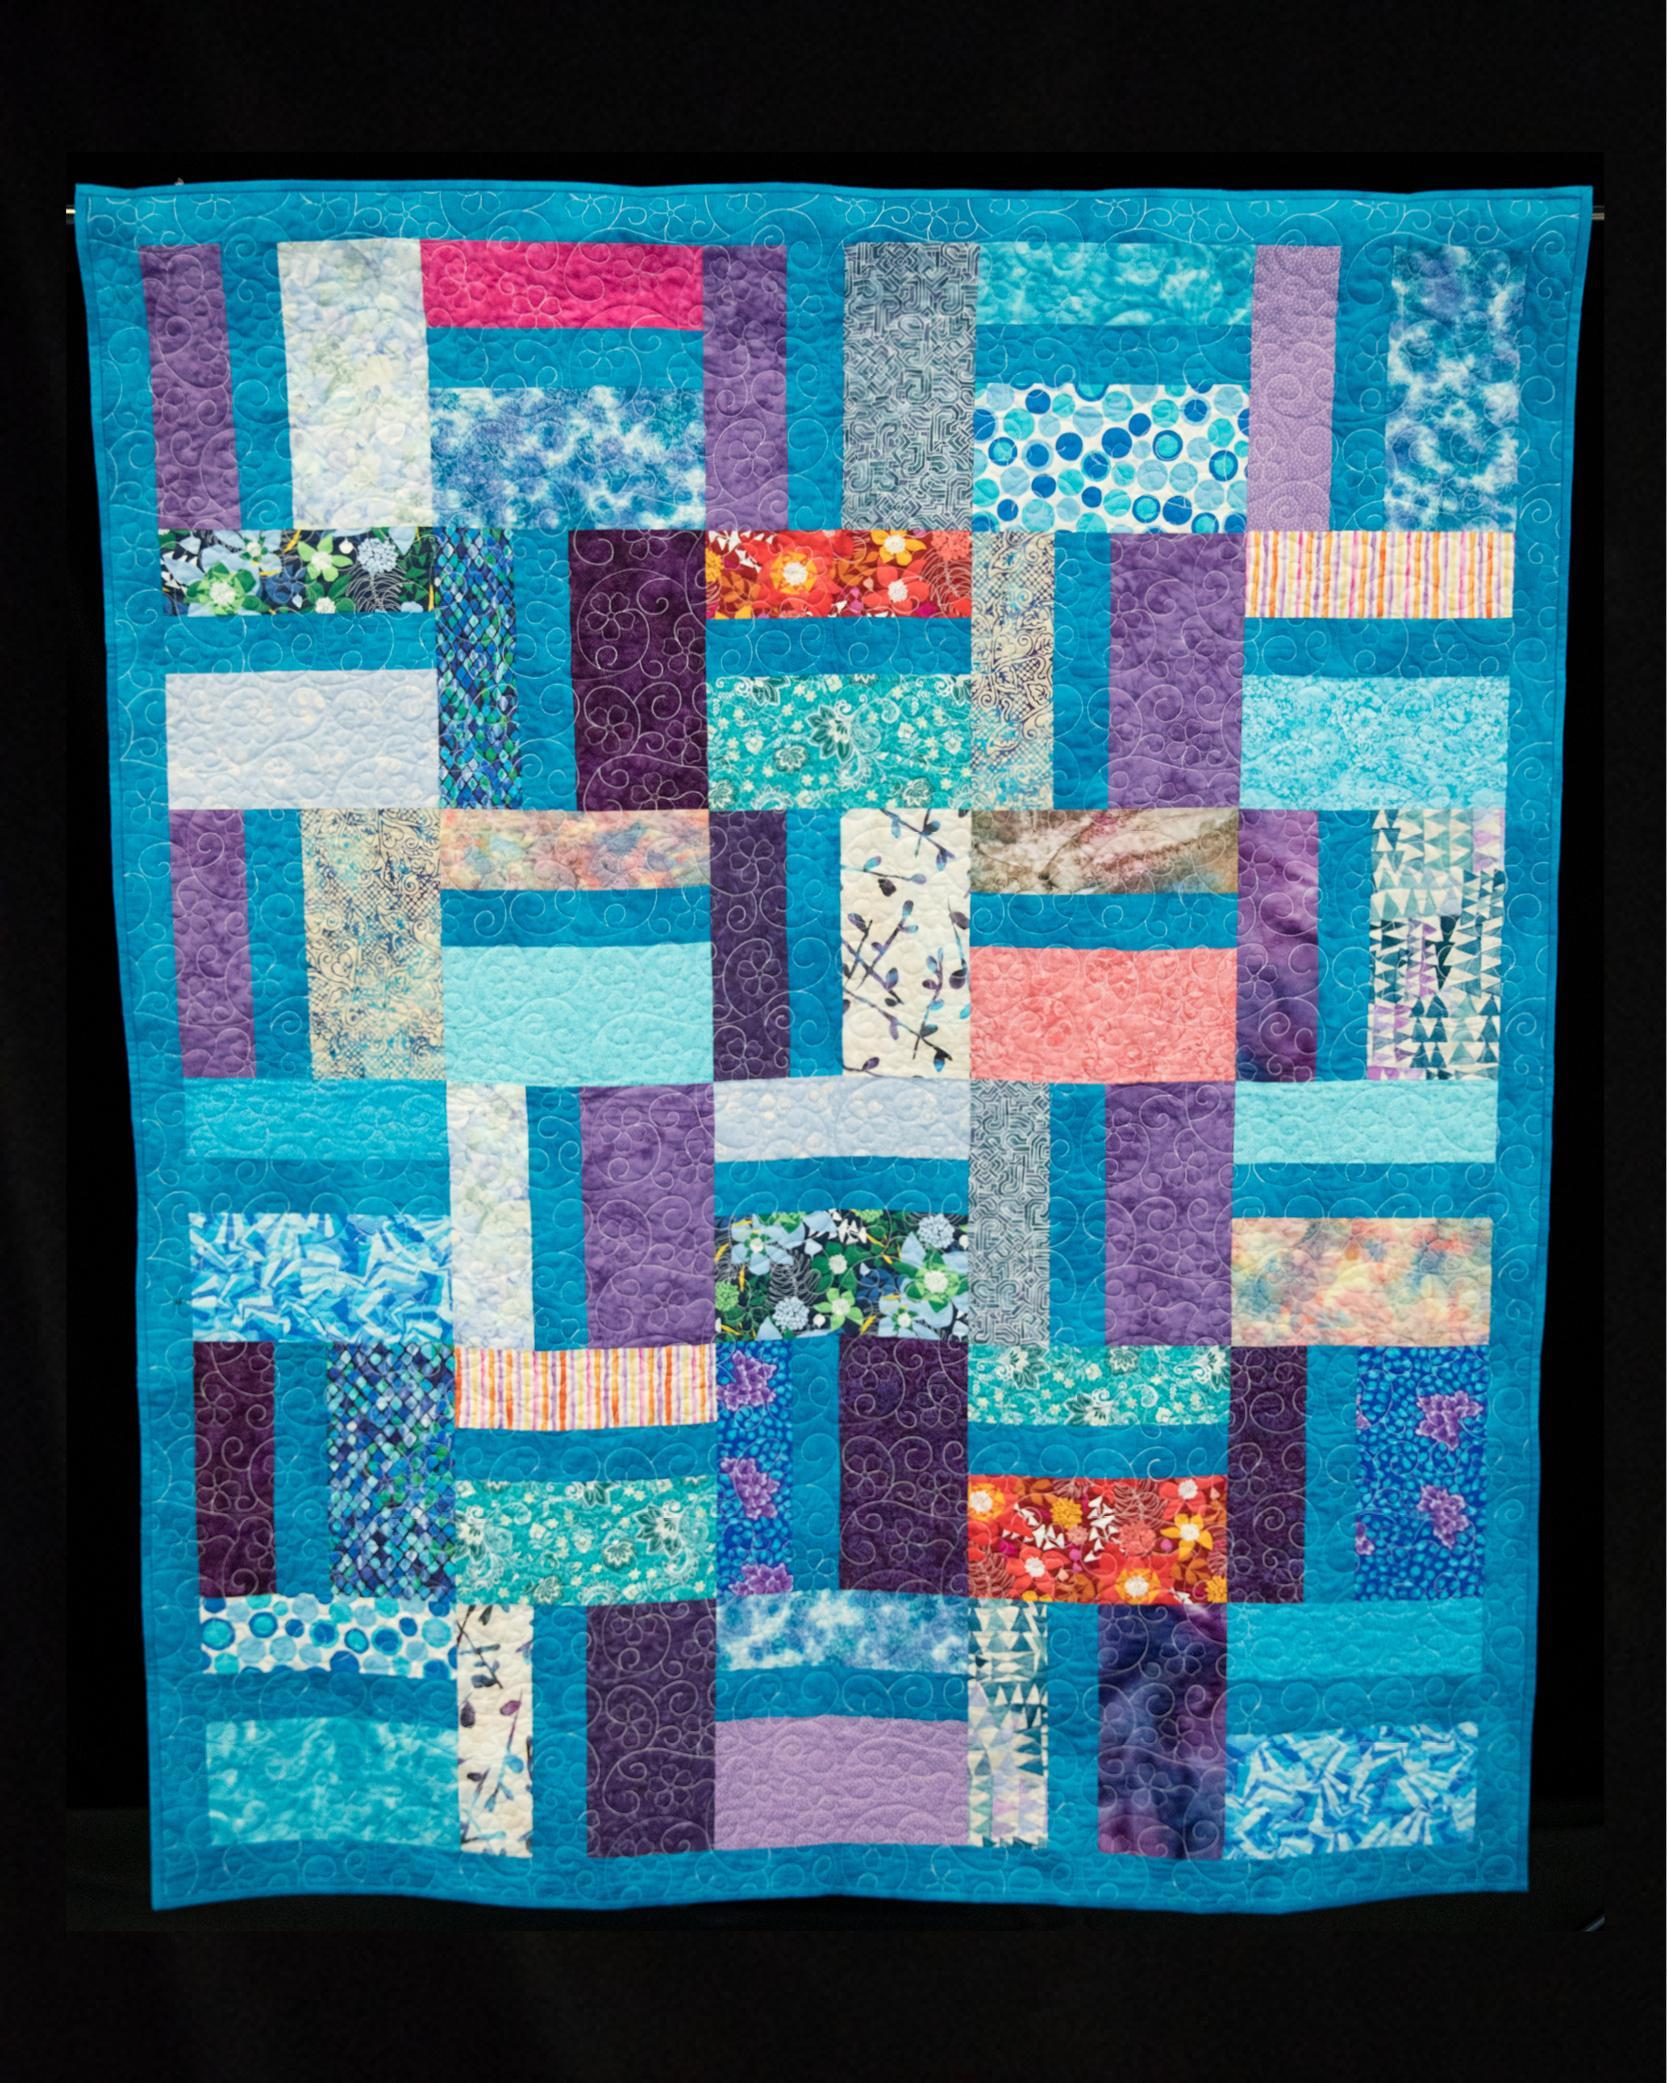 Ovarian Cancer Quilt Project S Online Auction 2019 Gail S Quilt Fl